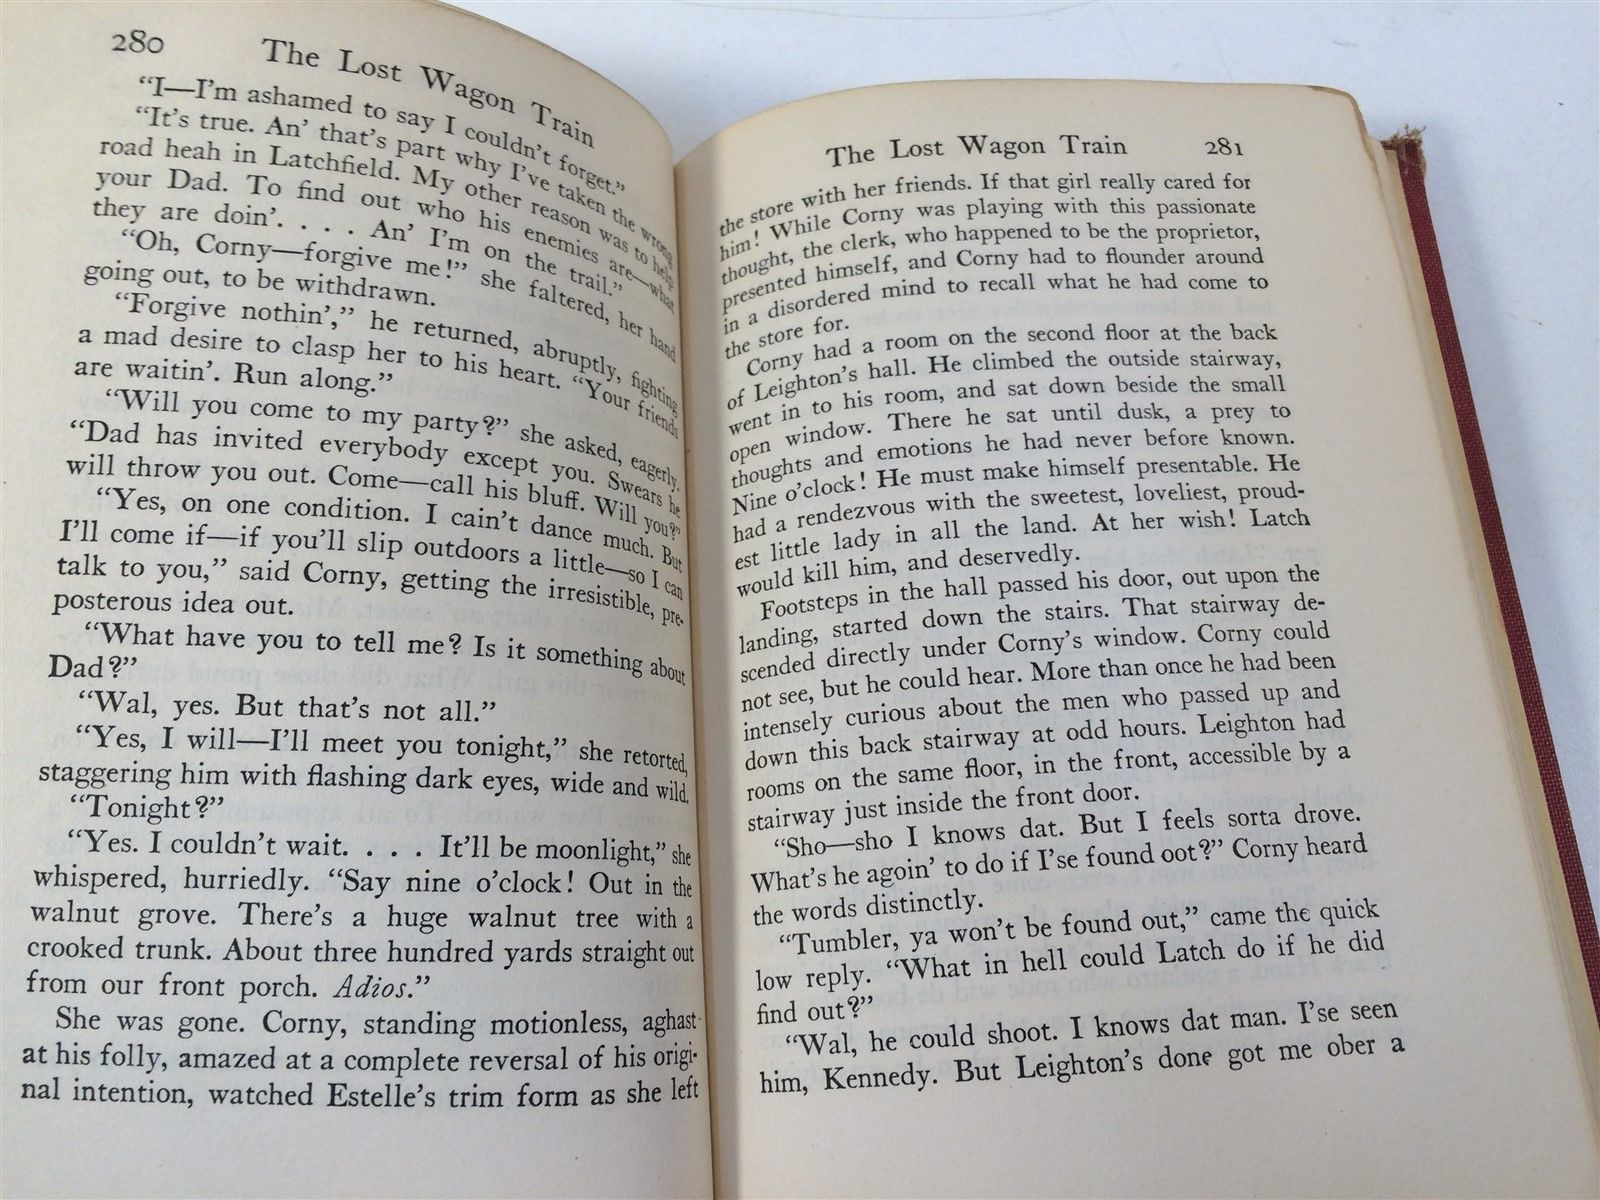 The Lost Wagon Train by Zane Grey HC 1936